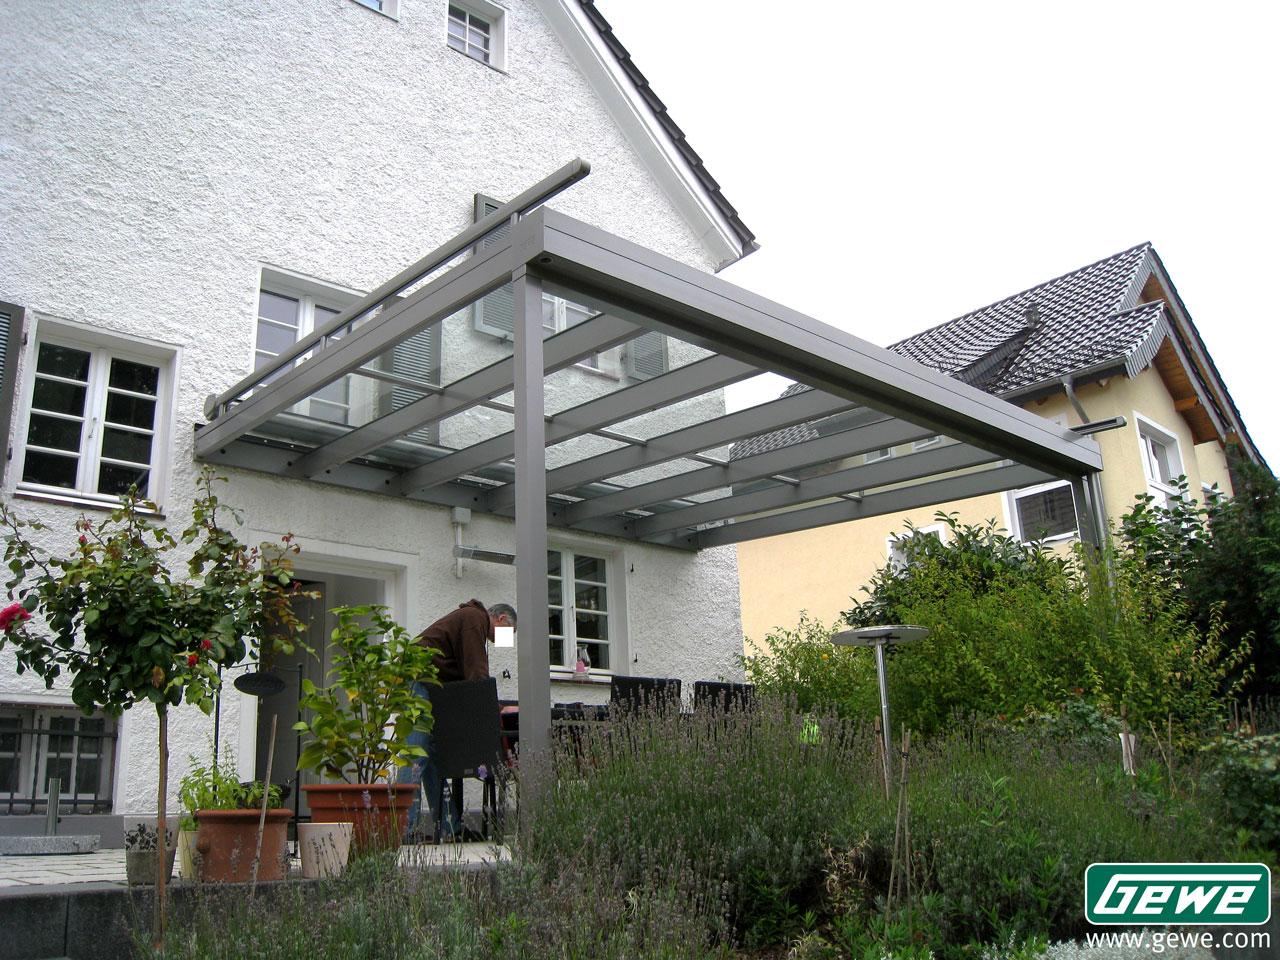 Terrassendach Holz Aluminium ~ Terrassendach Holz Aluminium Pictures to pin on Pinterest